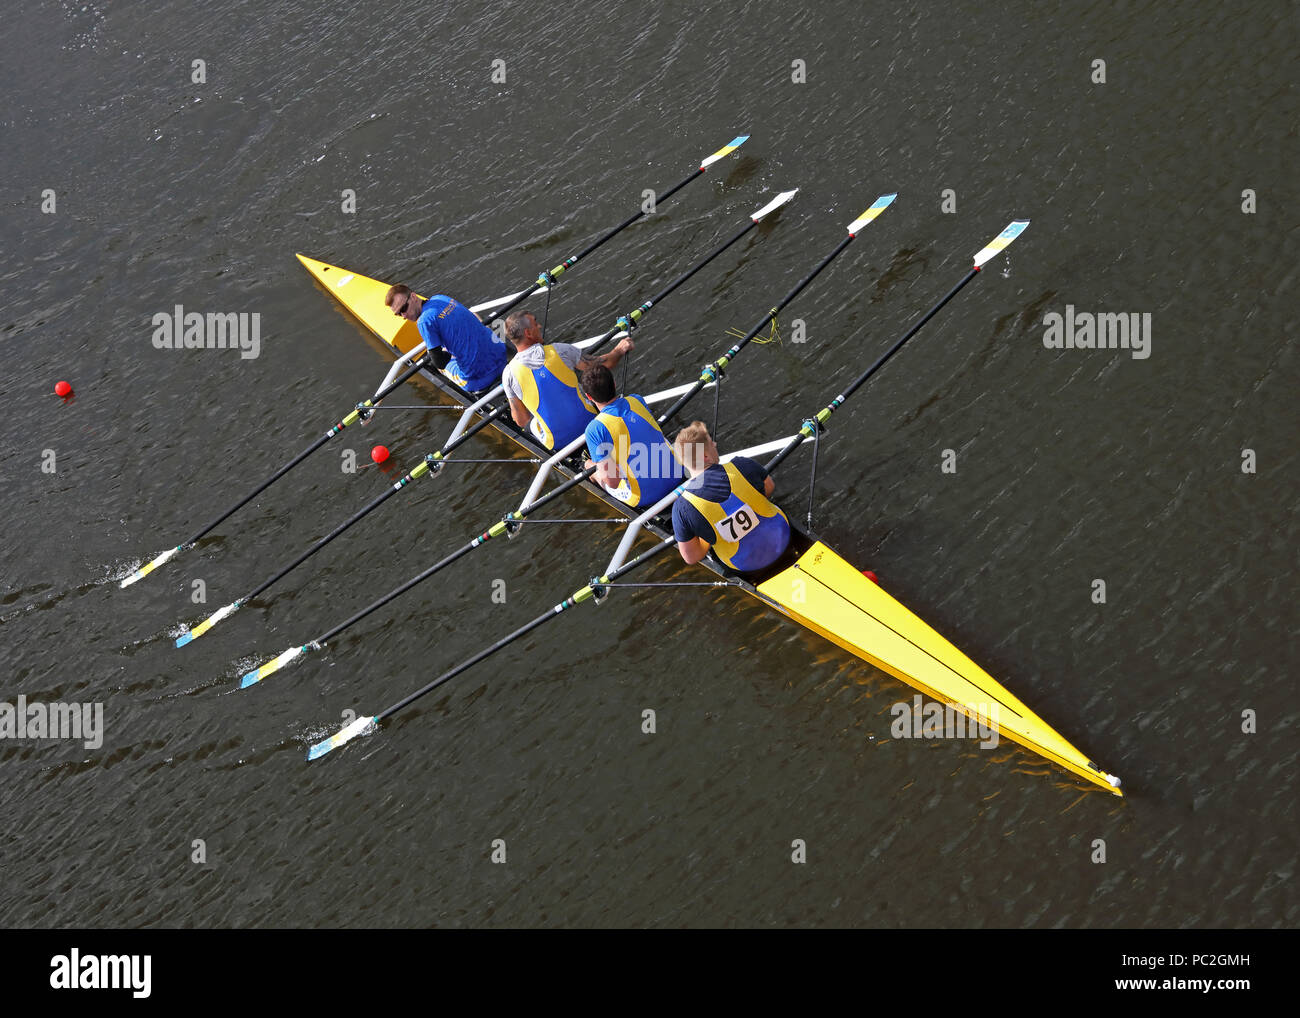 Mens quad team at Warrington Rowing Club 2018 Summer regatta, Howley lane, Mersey River, Cheshire, North West England, UK Stock Photo